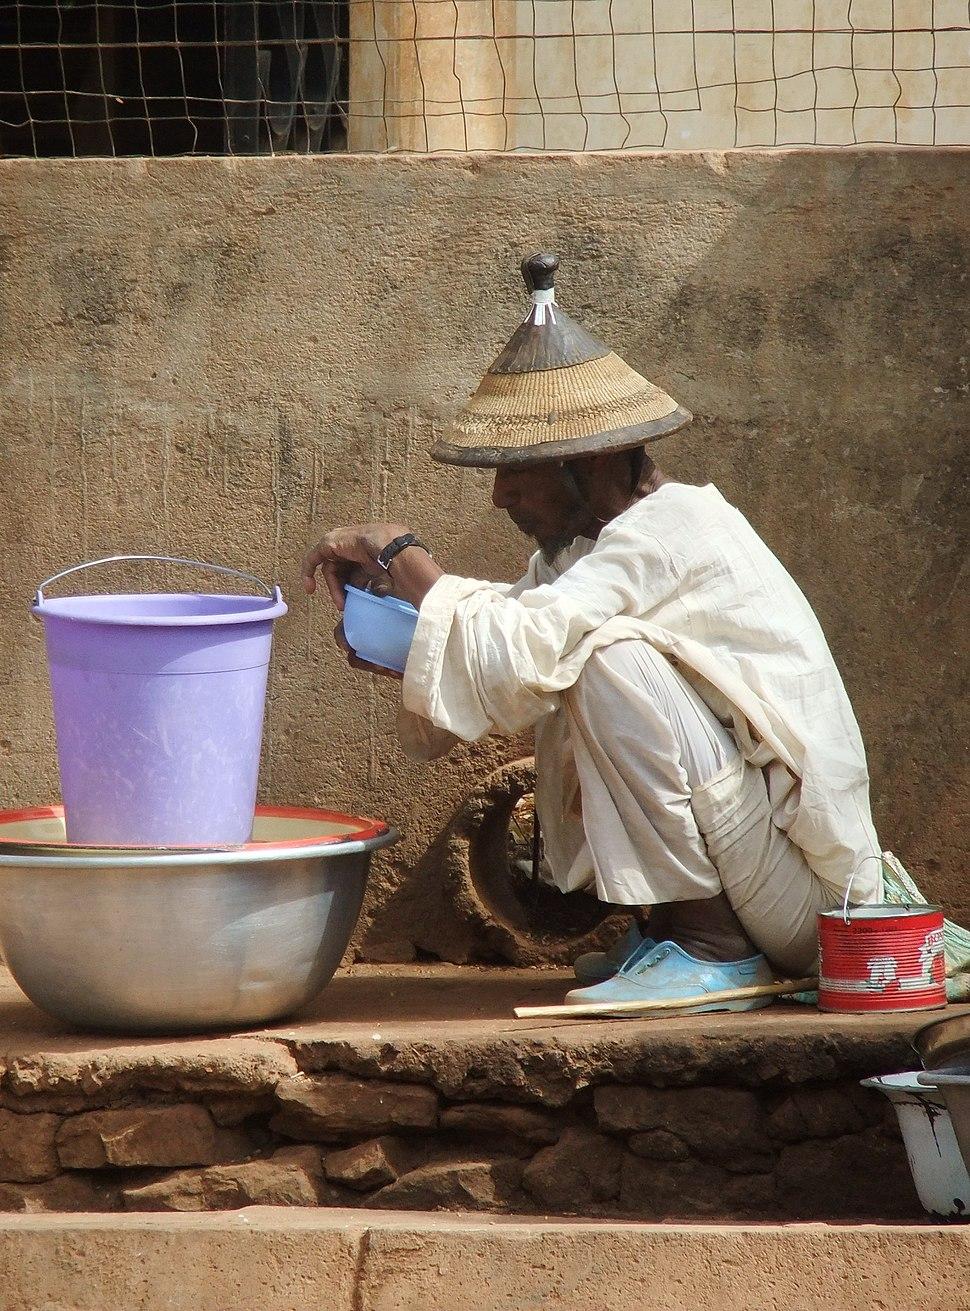 A Pullo (Fulani) man in Garibou village, Togo, West Africa